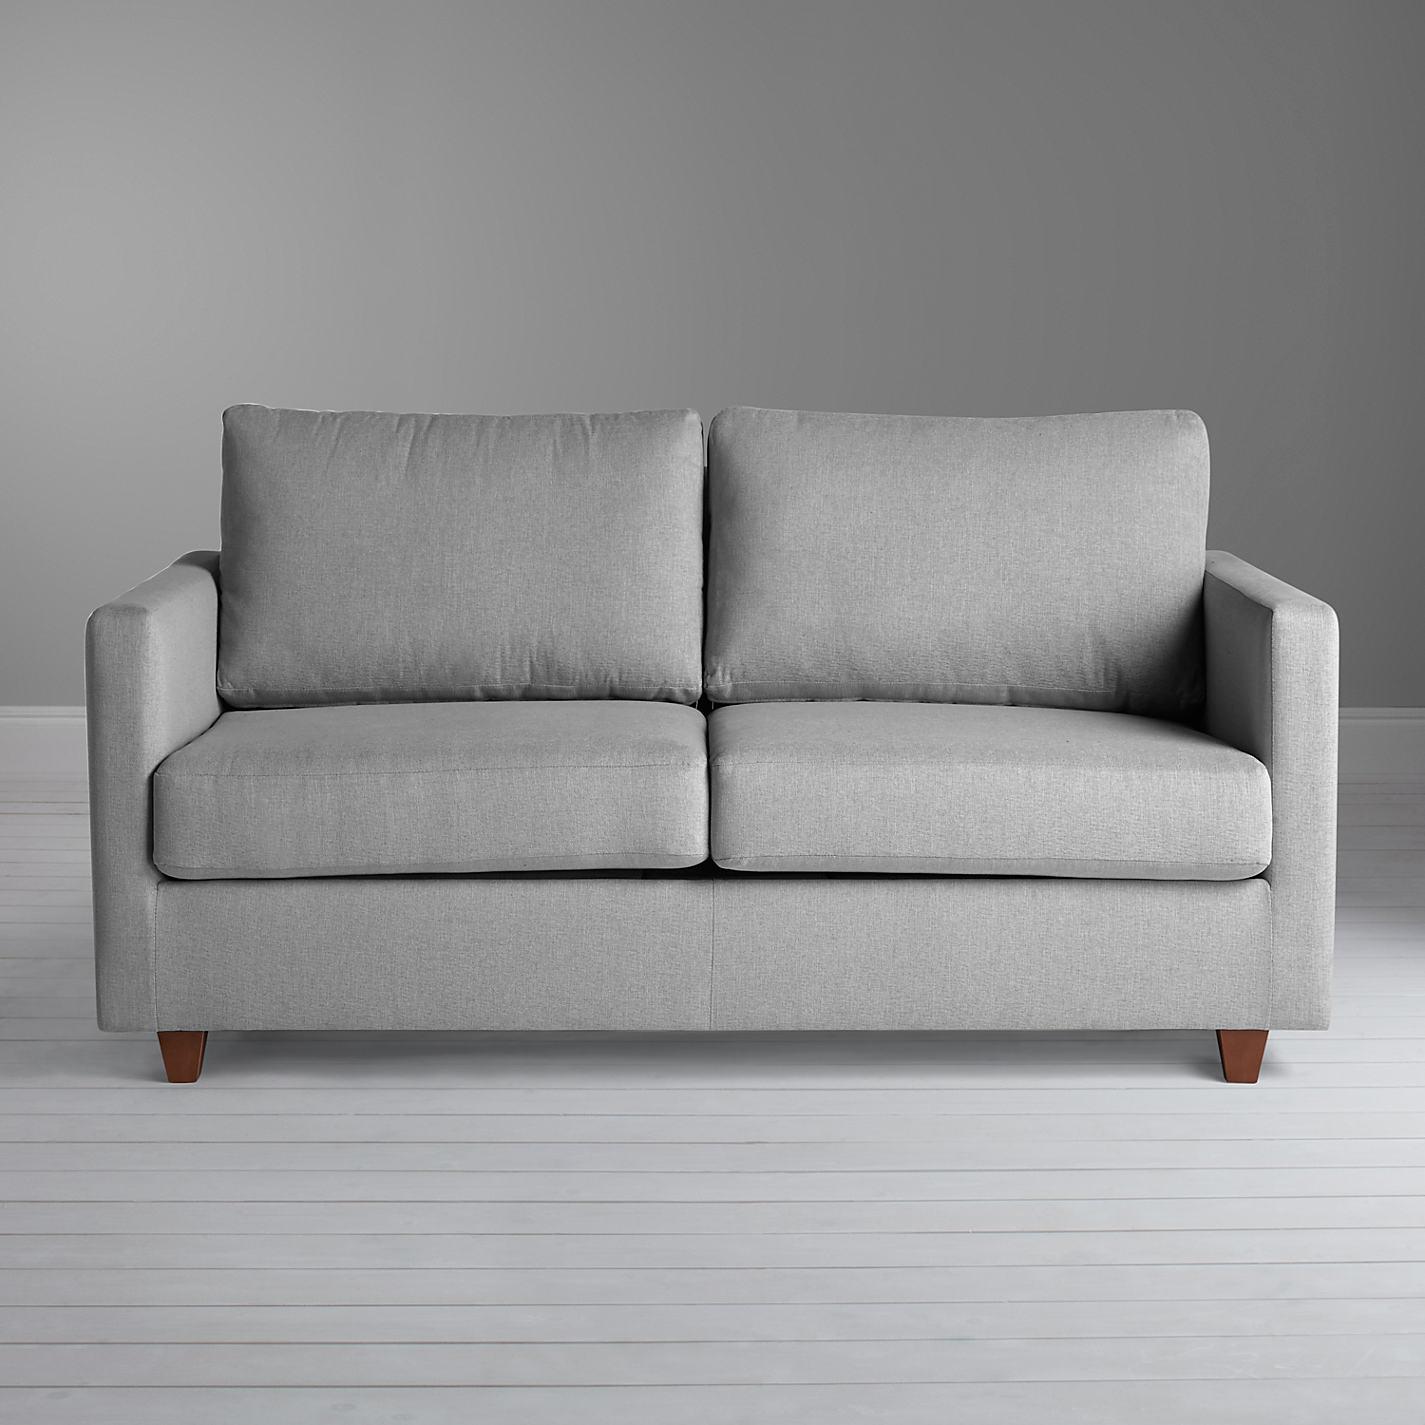 ... buy john lewis barlow 2 seater small sofa bed with pocket sprung YJHUPAU